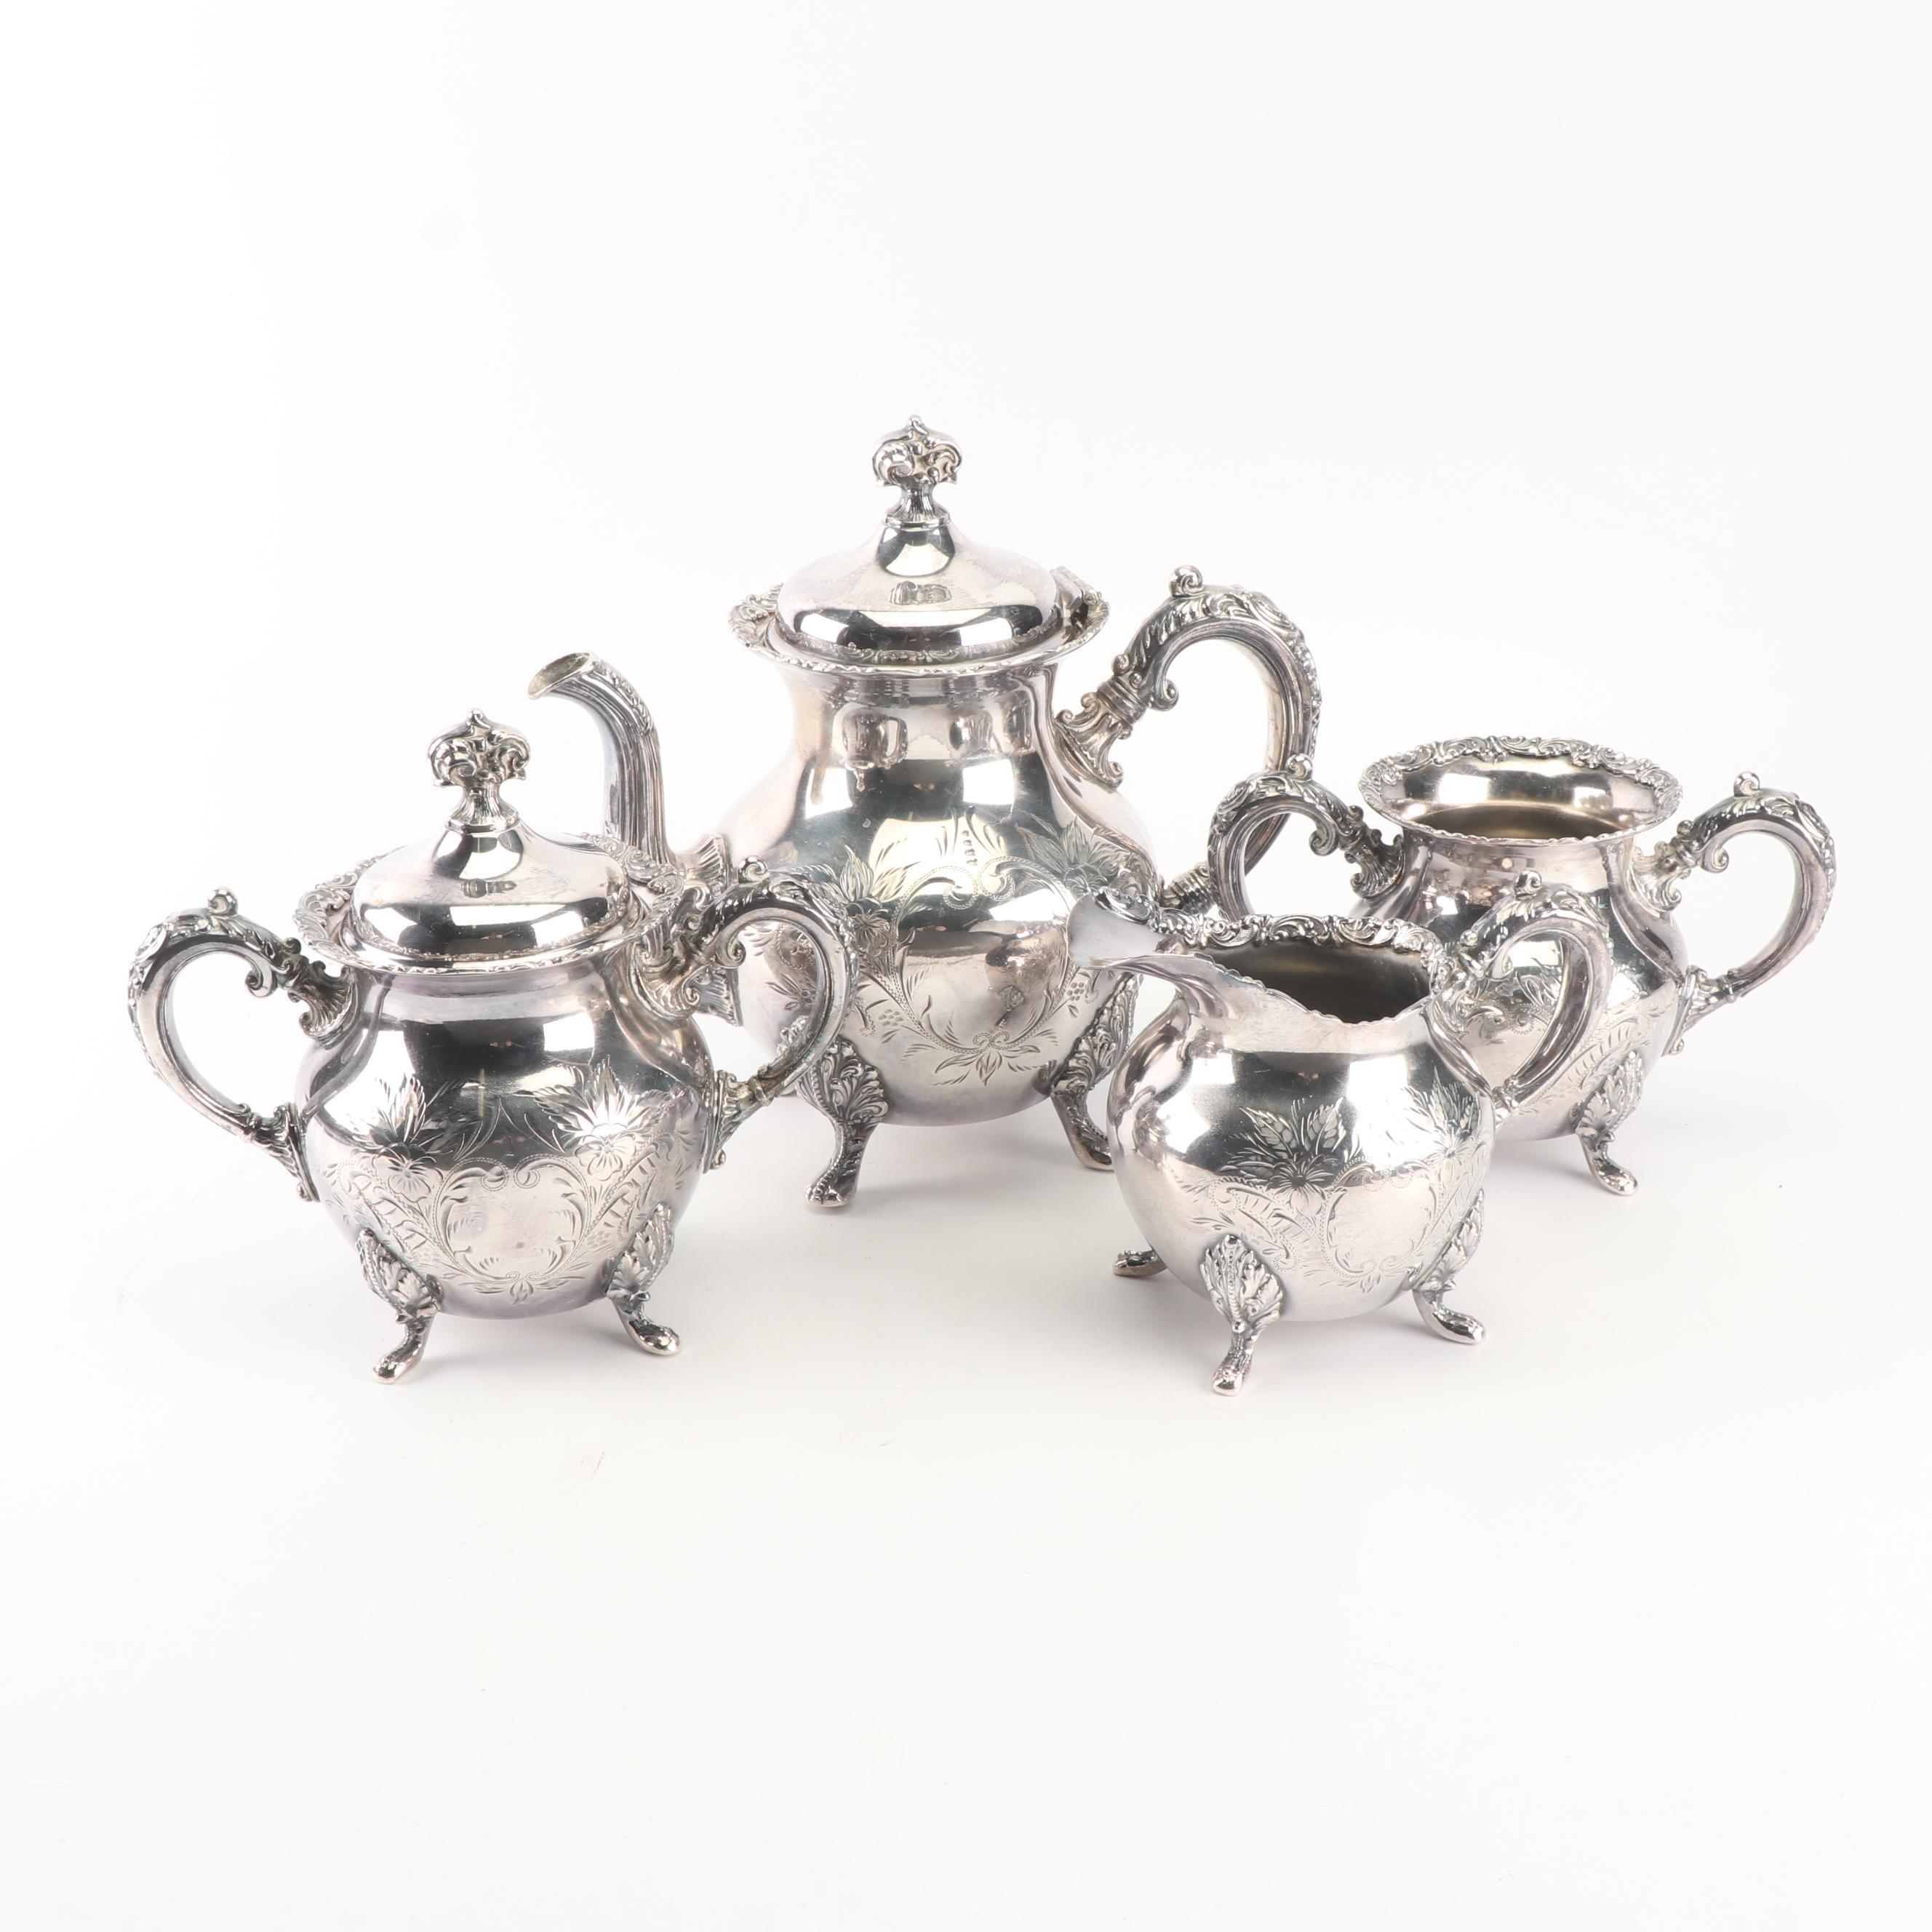 Van Bergh Silver Plate Co. Quadruple Plate Four-Piece Tea Set